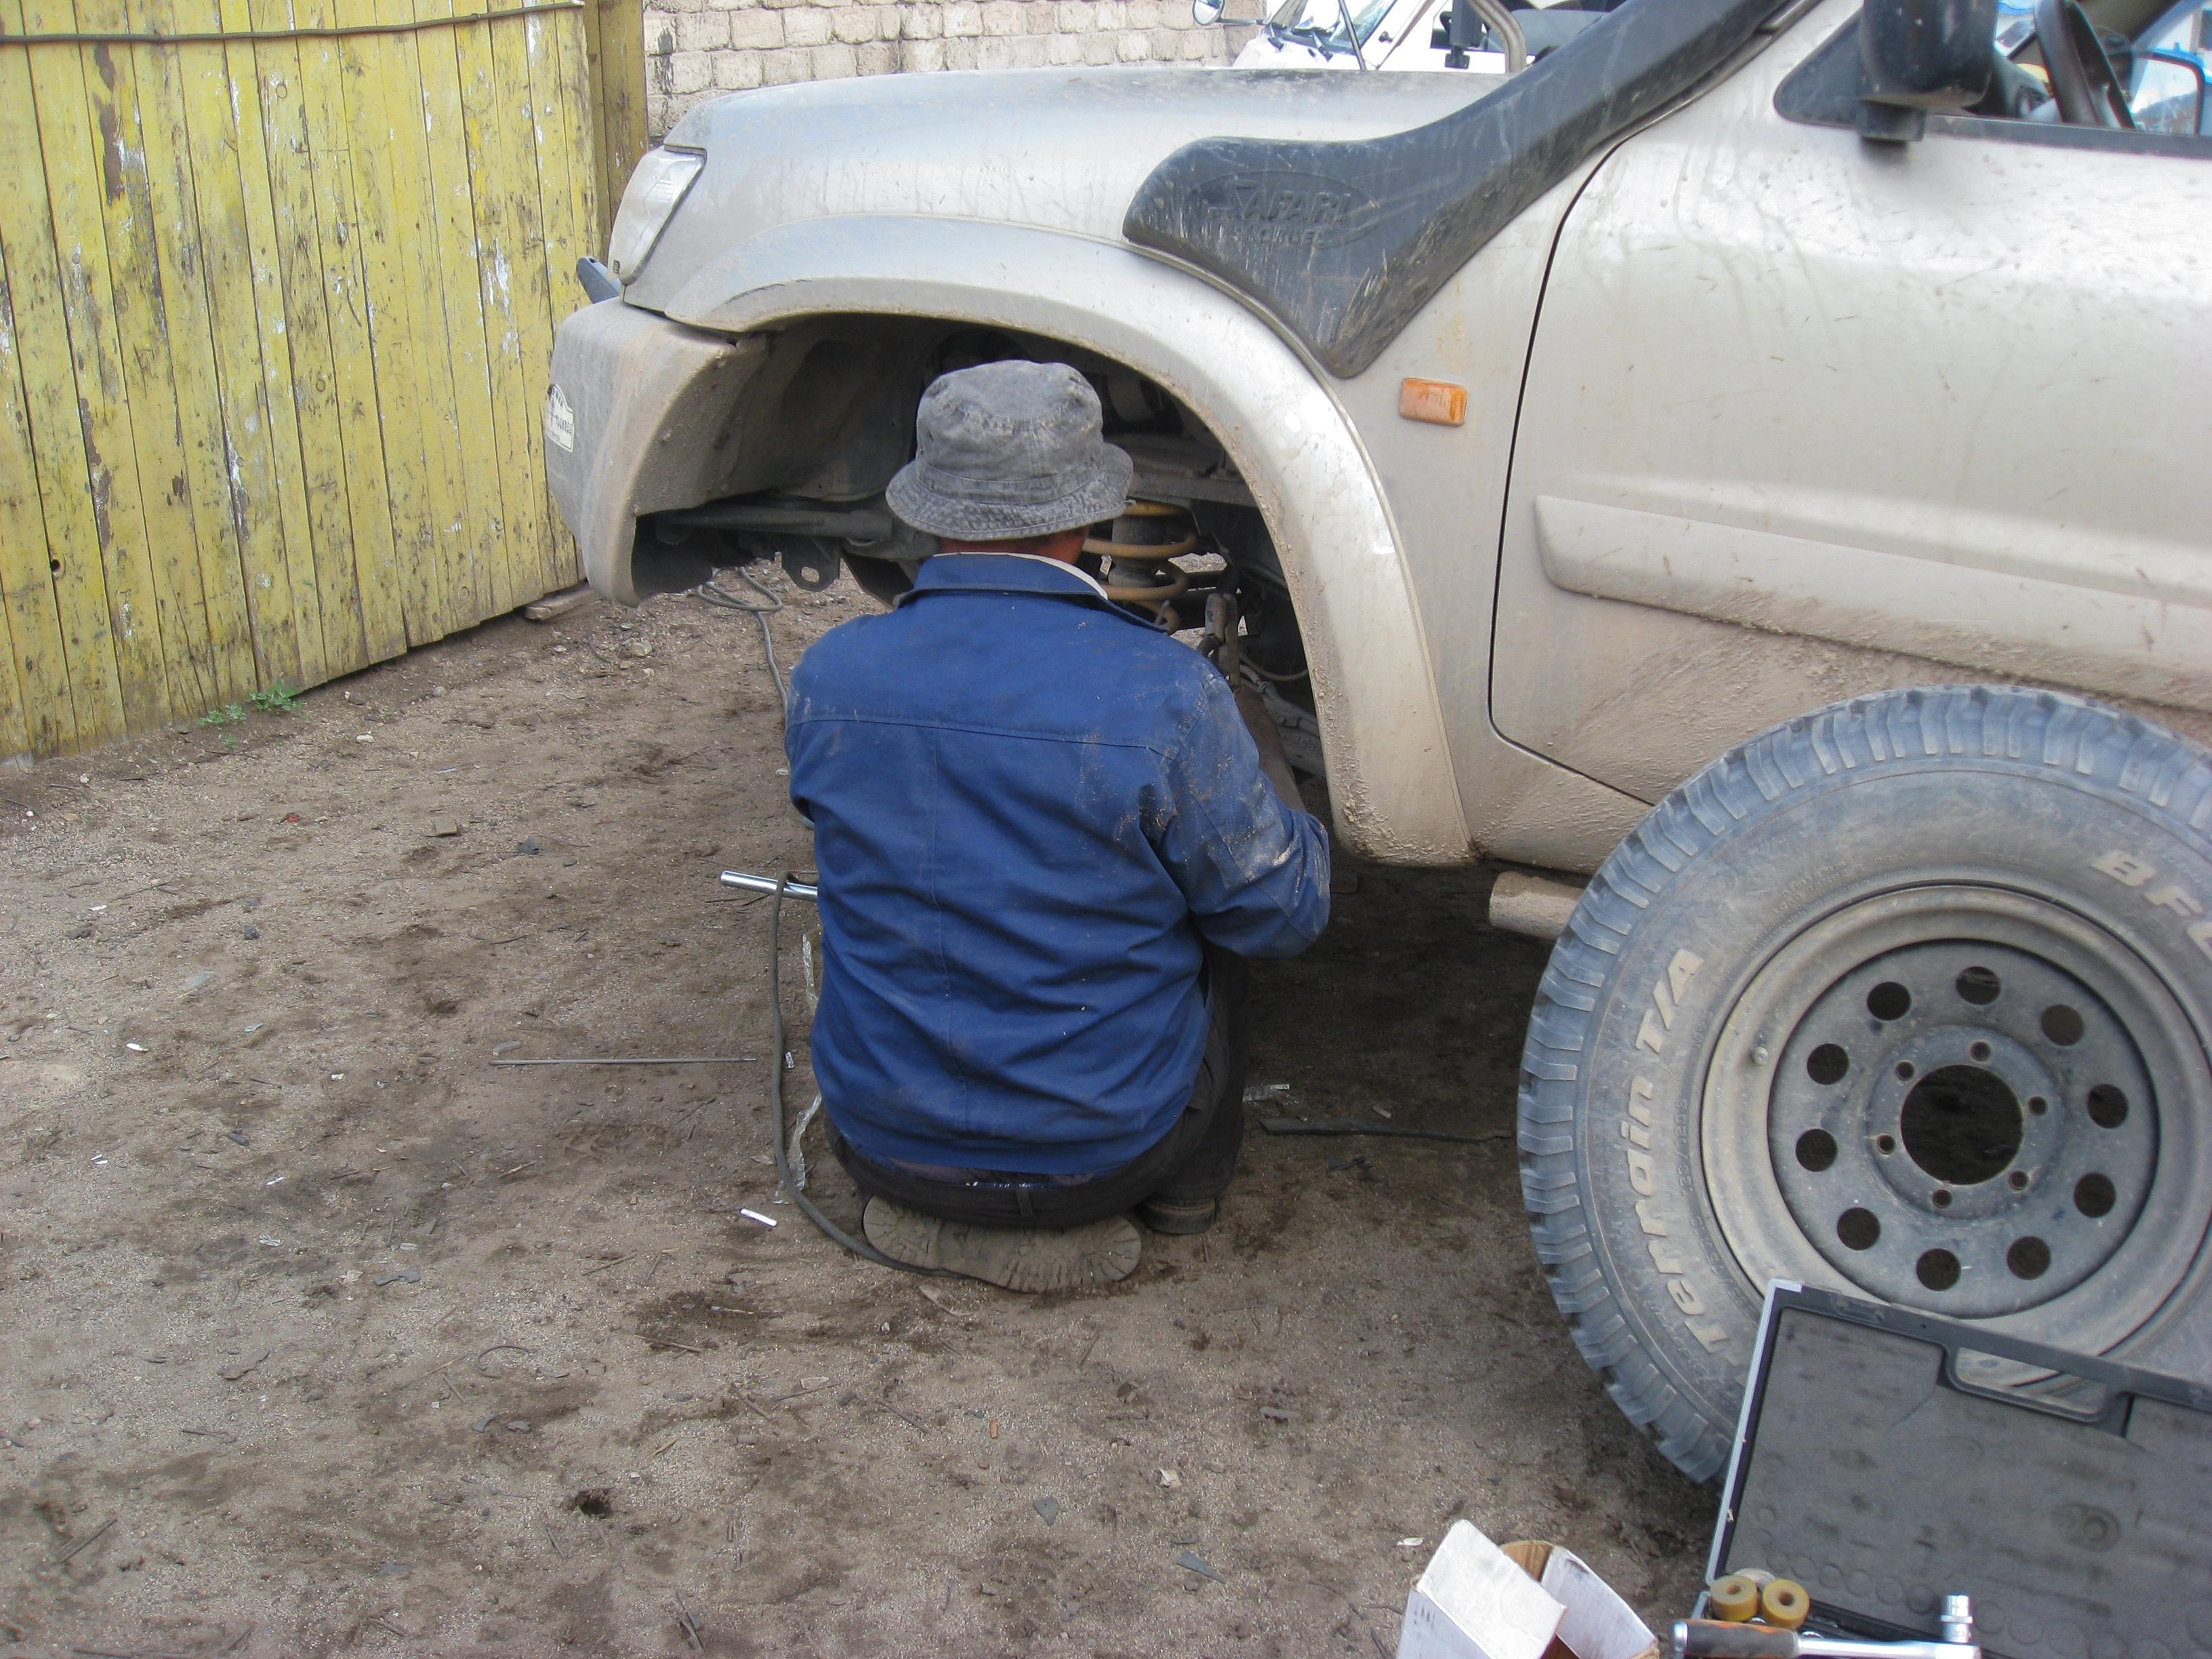 free images wheel jeep garage bumper rim mongolia car breakdown city car off road. Black Bedroom Furniture Sets. Home Design Ideas